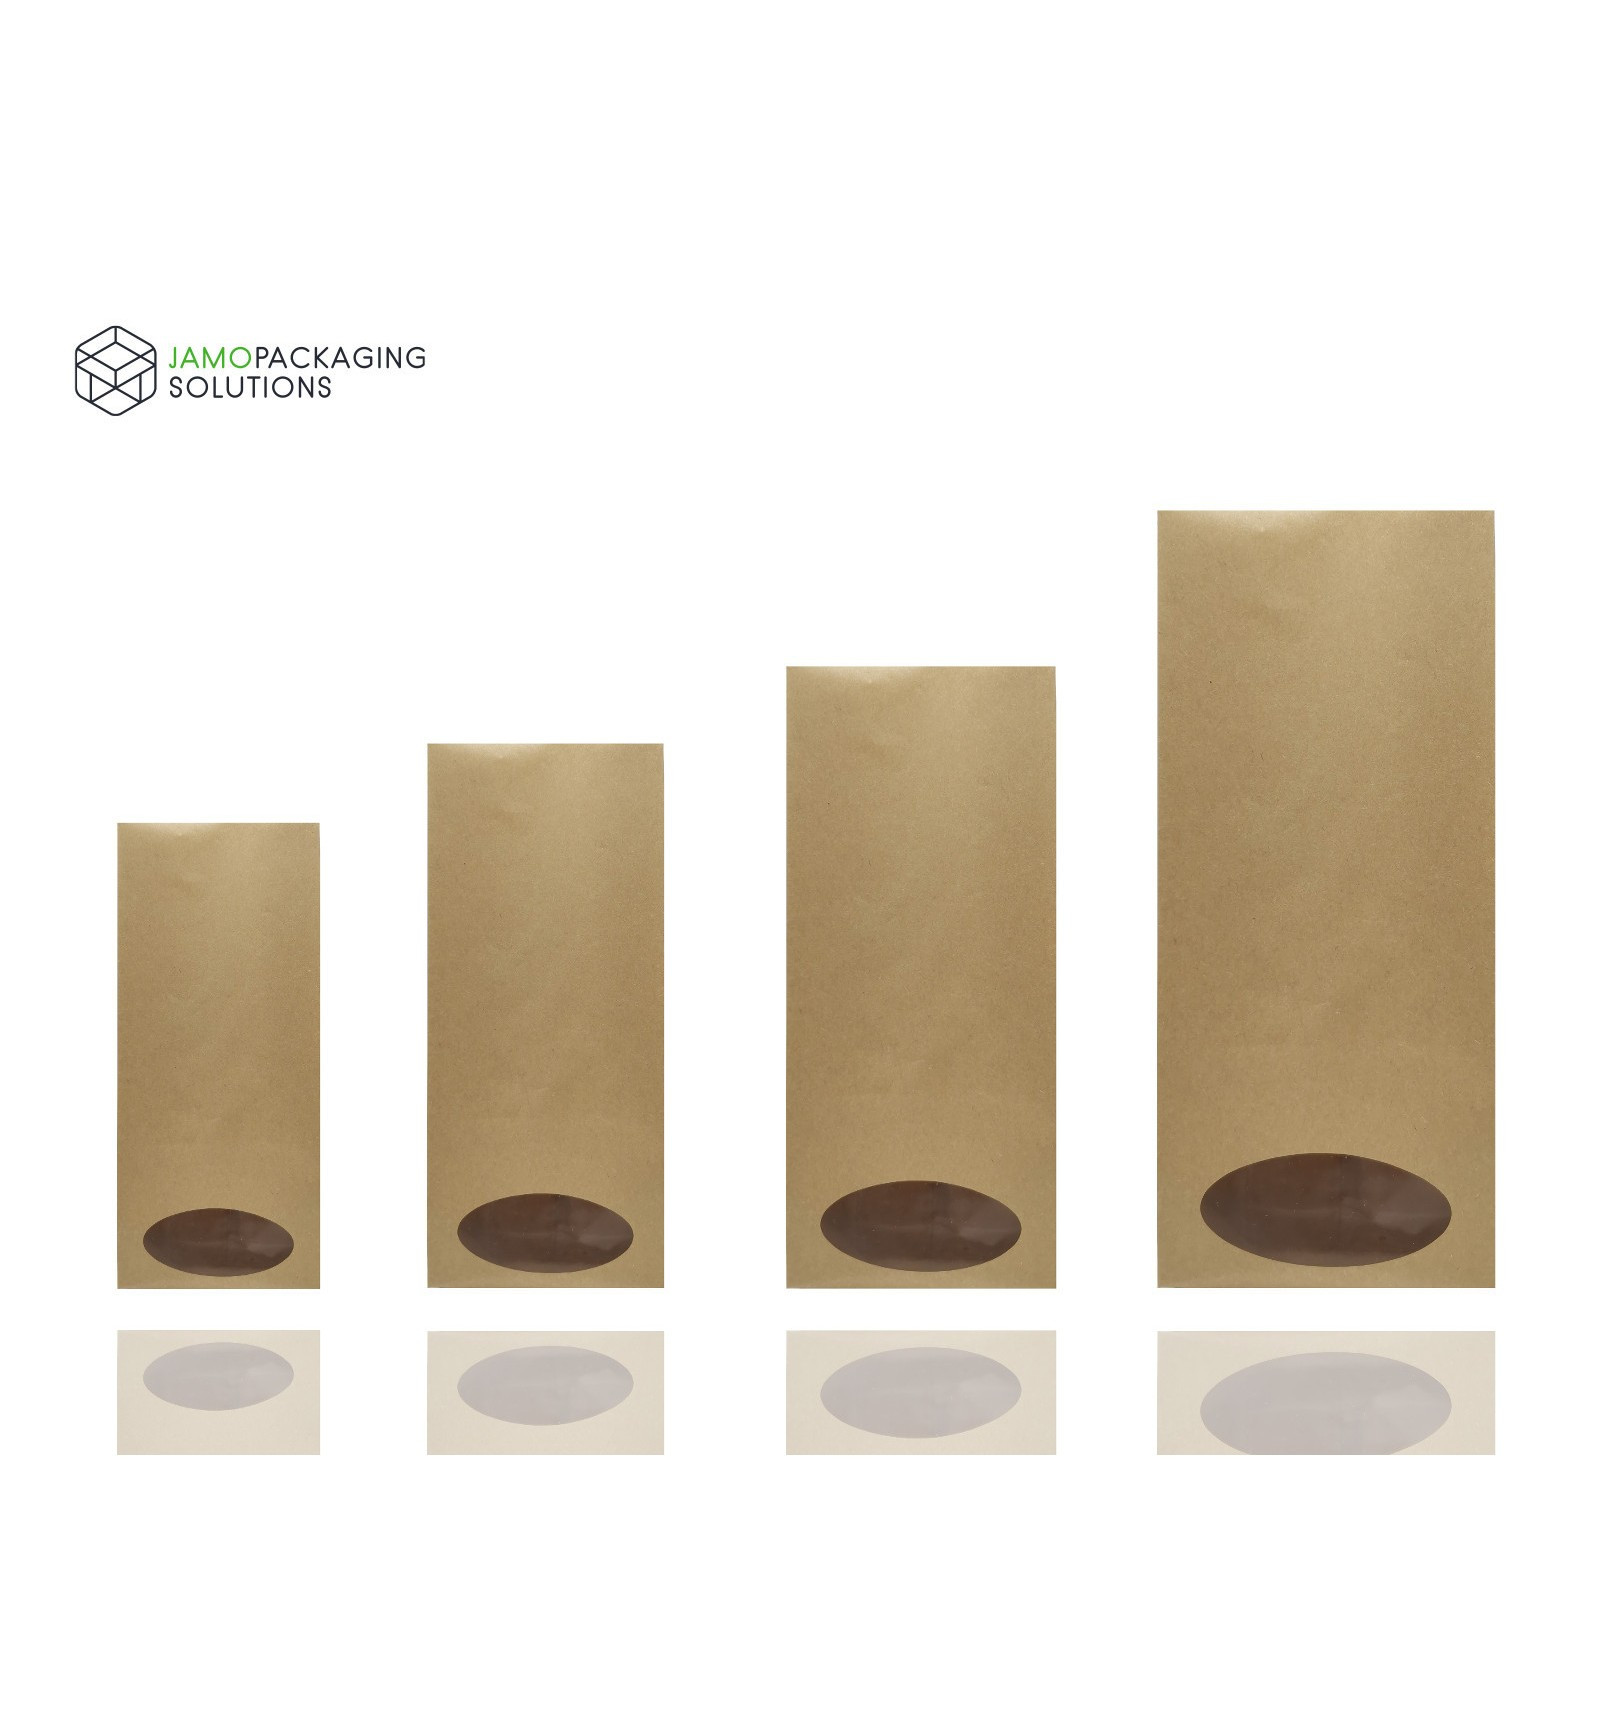 Oval Window Kraft Paper Side Gusset Bag Heat Seal Natural Look